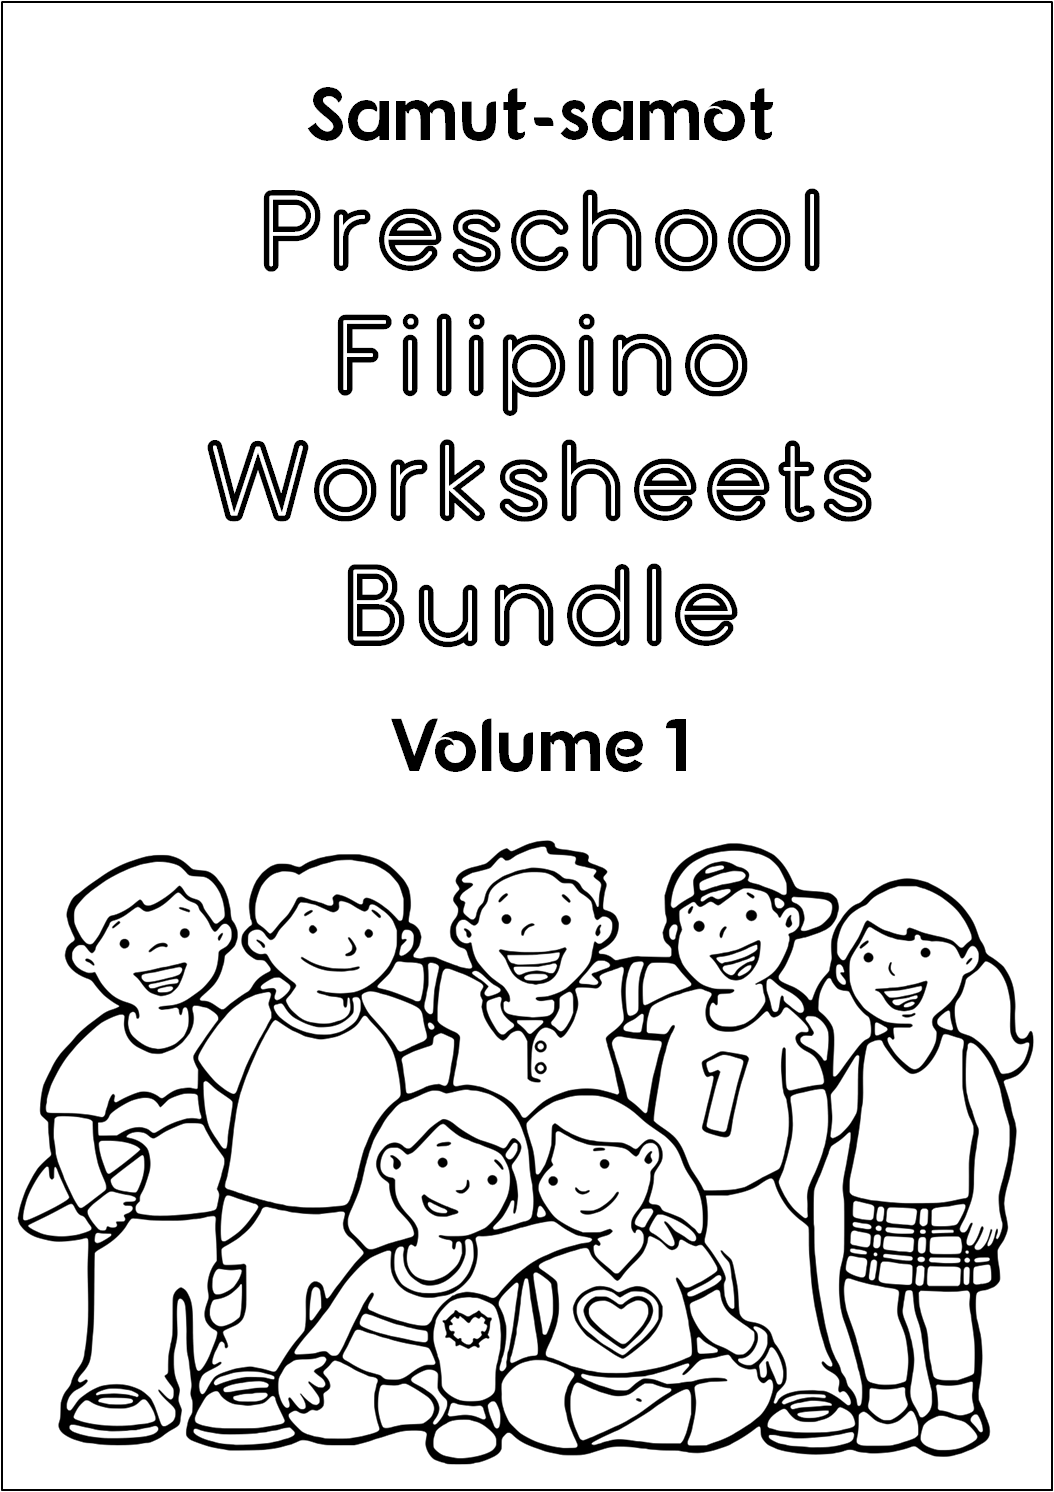 hight resolution of Preschool Filipino Worksheets Bundle Vol. 1 - Samut-samot